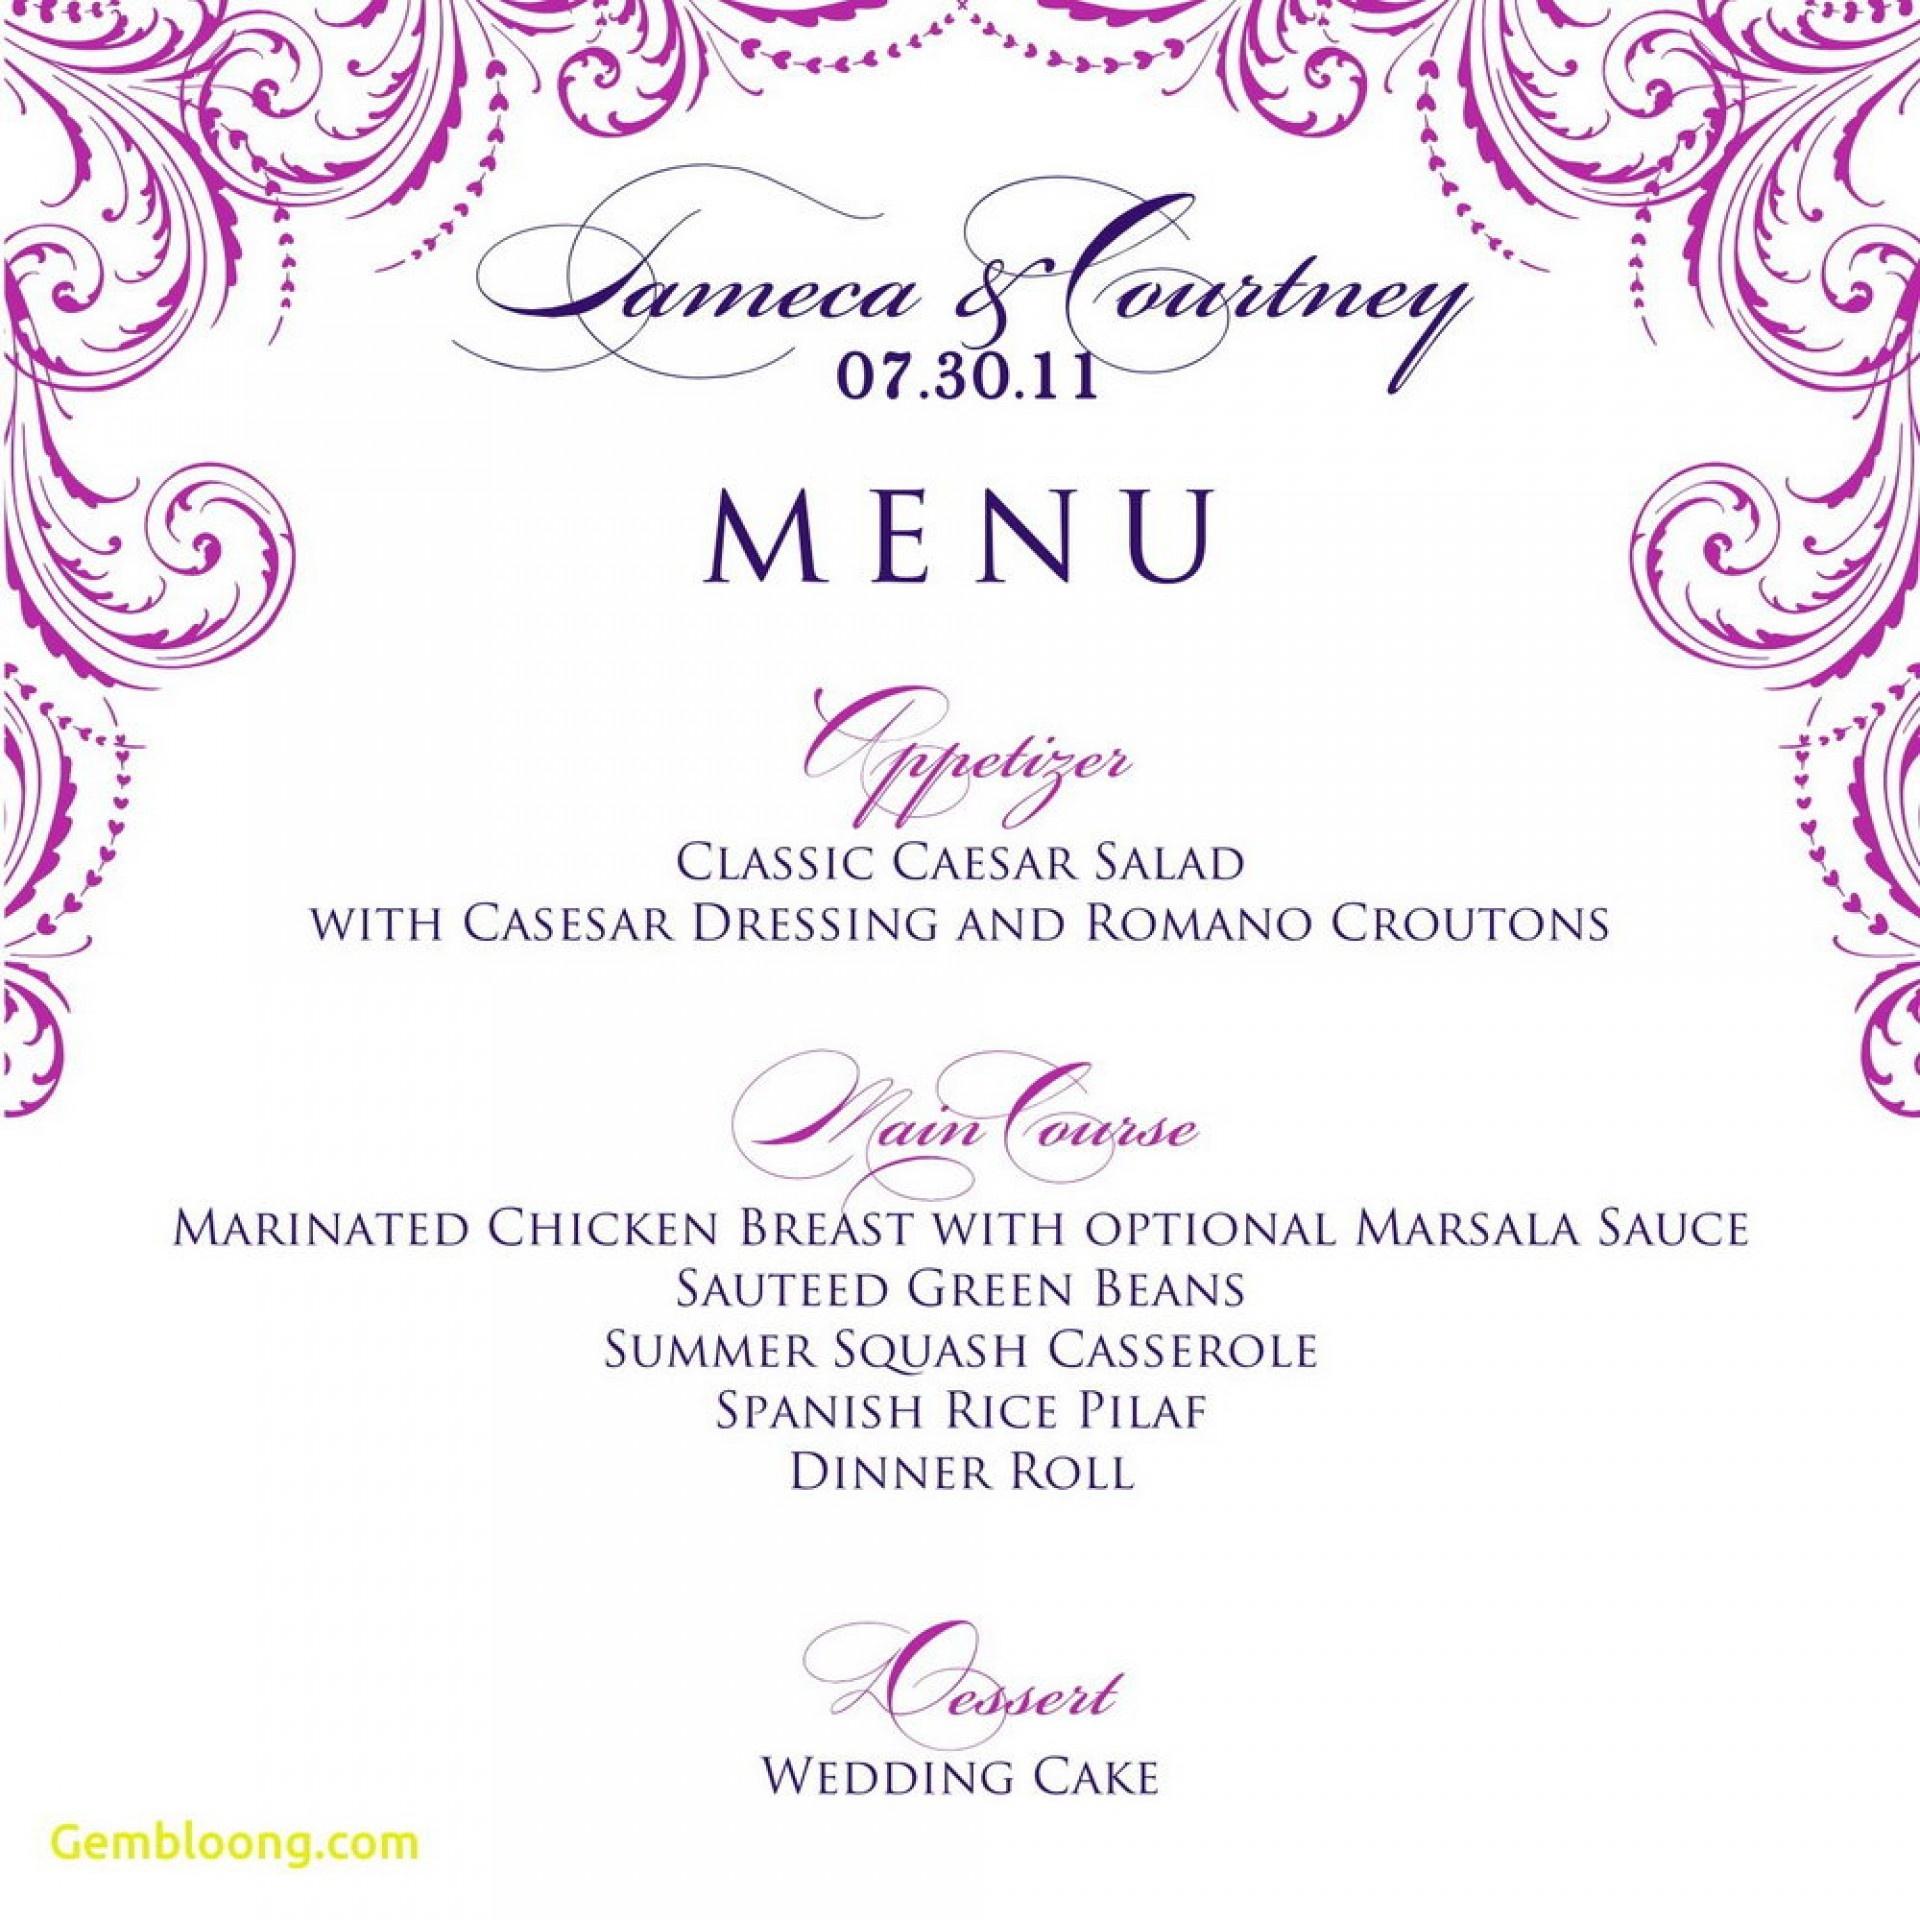 015 Template Ideas Dinner Menu Templates Free Amazing Marvelous - Free Printable Birthday Menu Templates